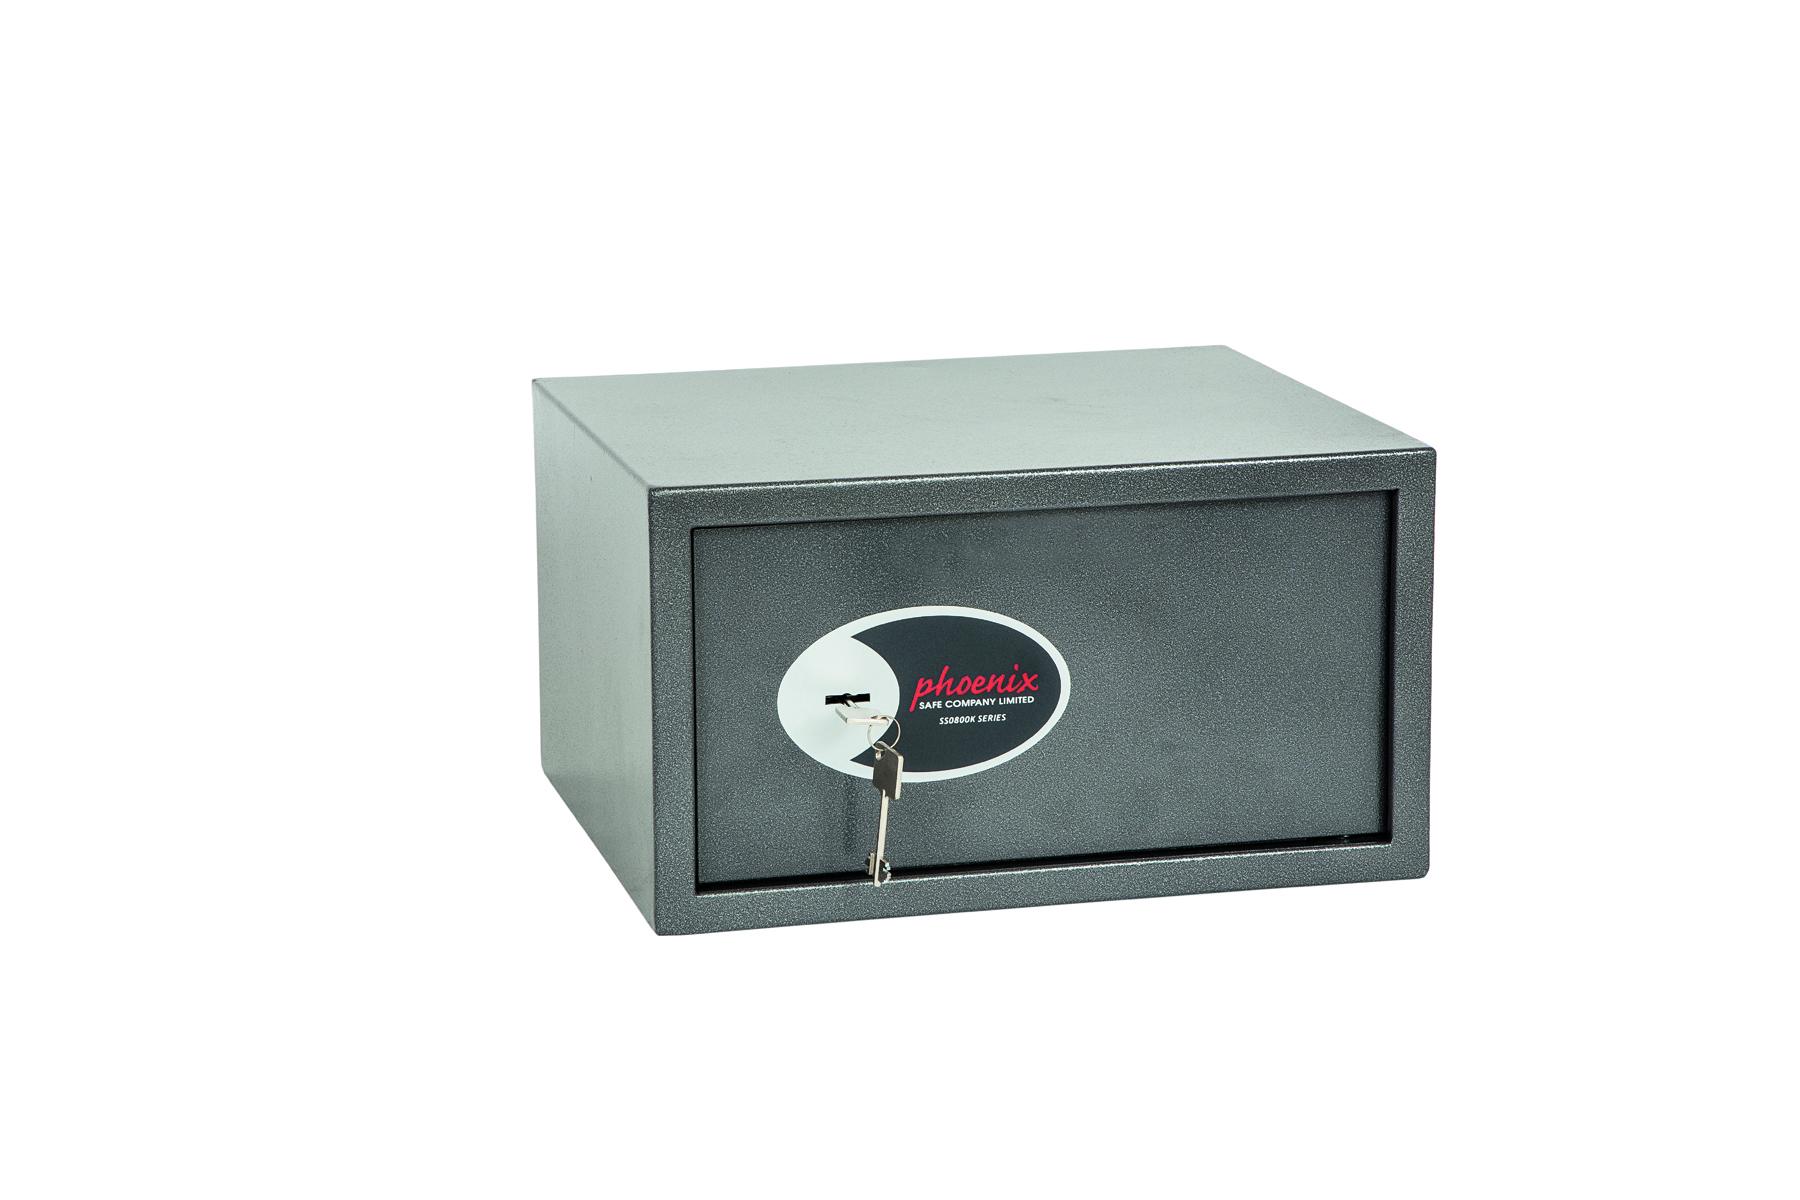 Phoenix Vela Home and Office Size 3 Security Safe Key Lock Graphite Grey SS0803K